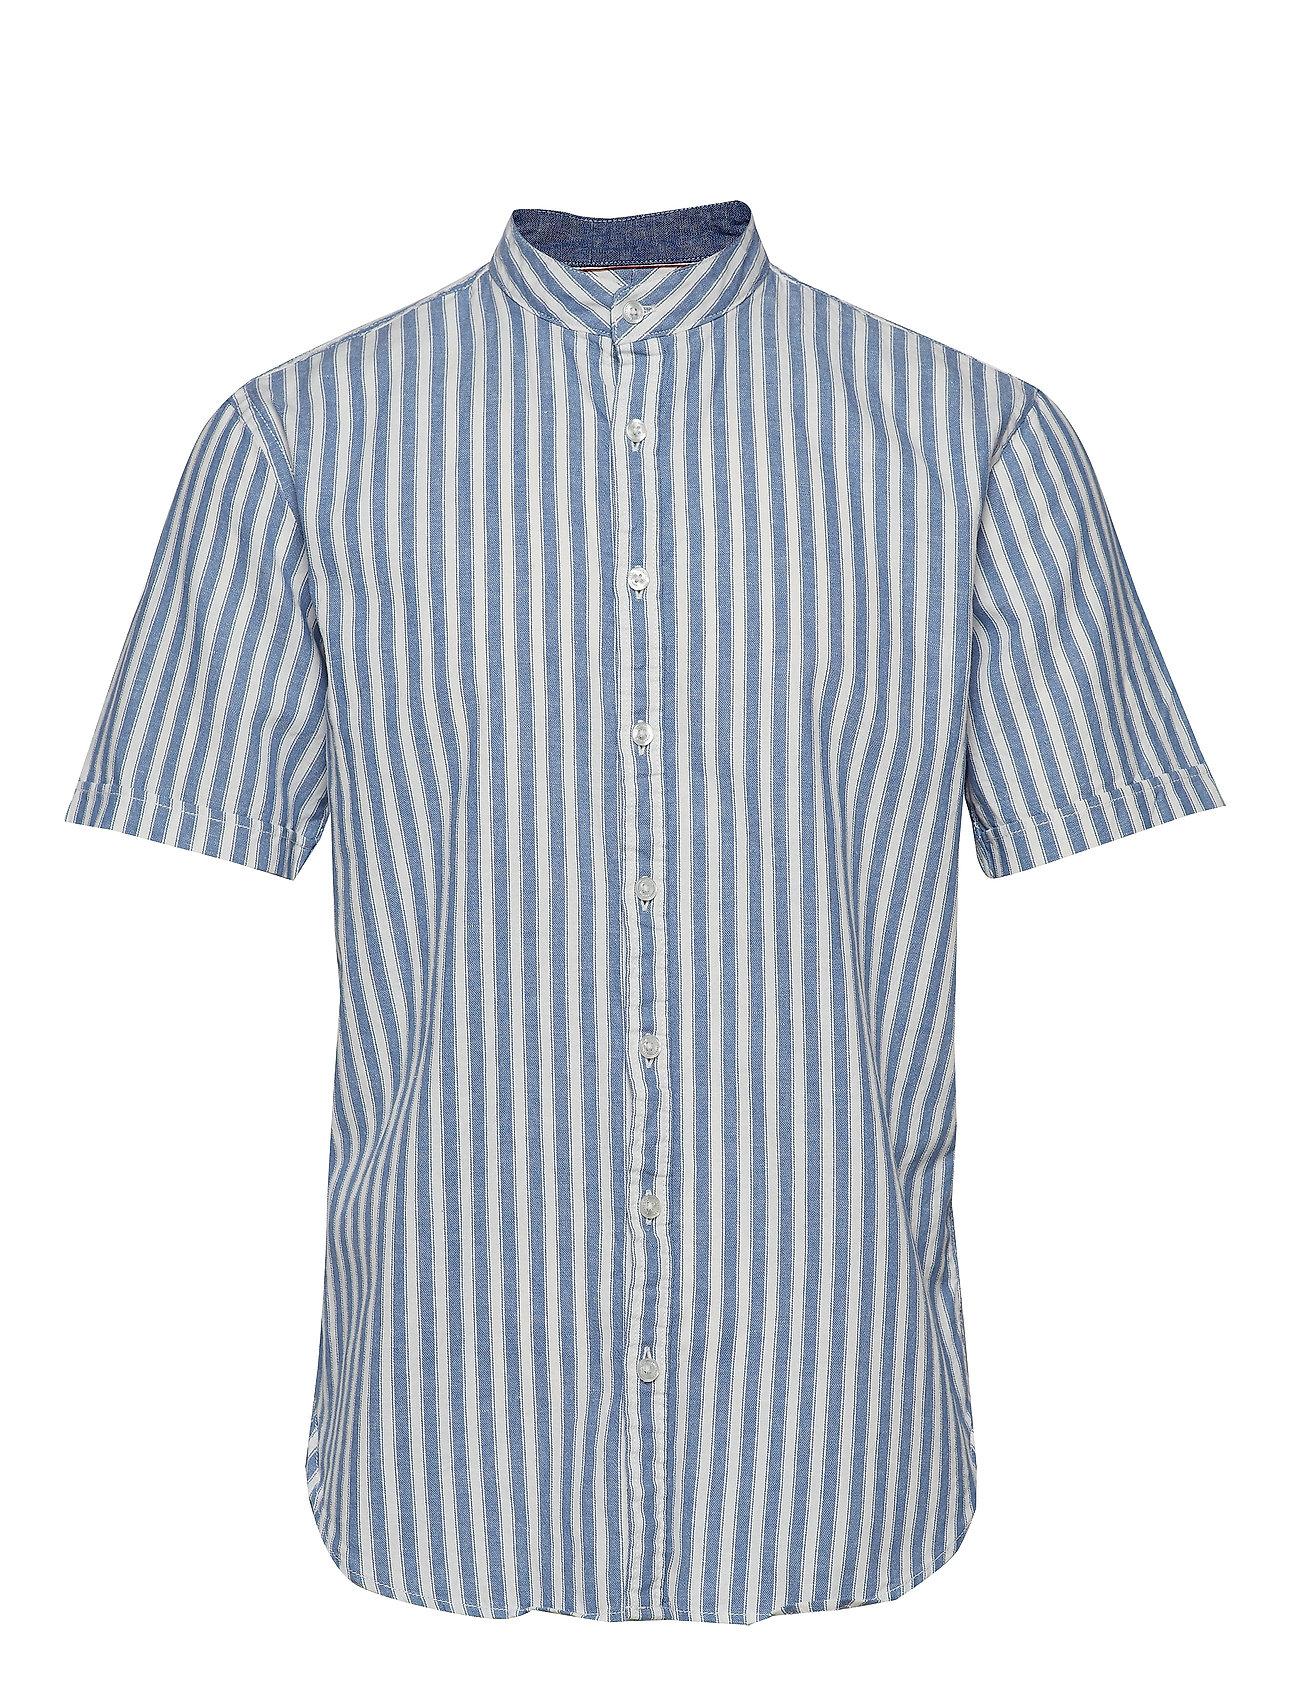 Lindbergh Cotton/linen striped shirt S/S